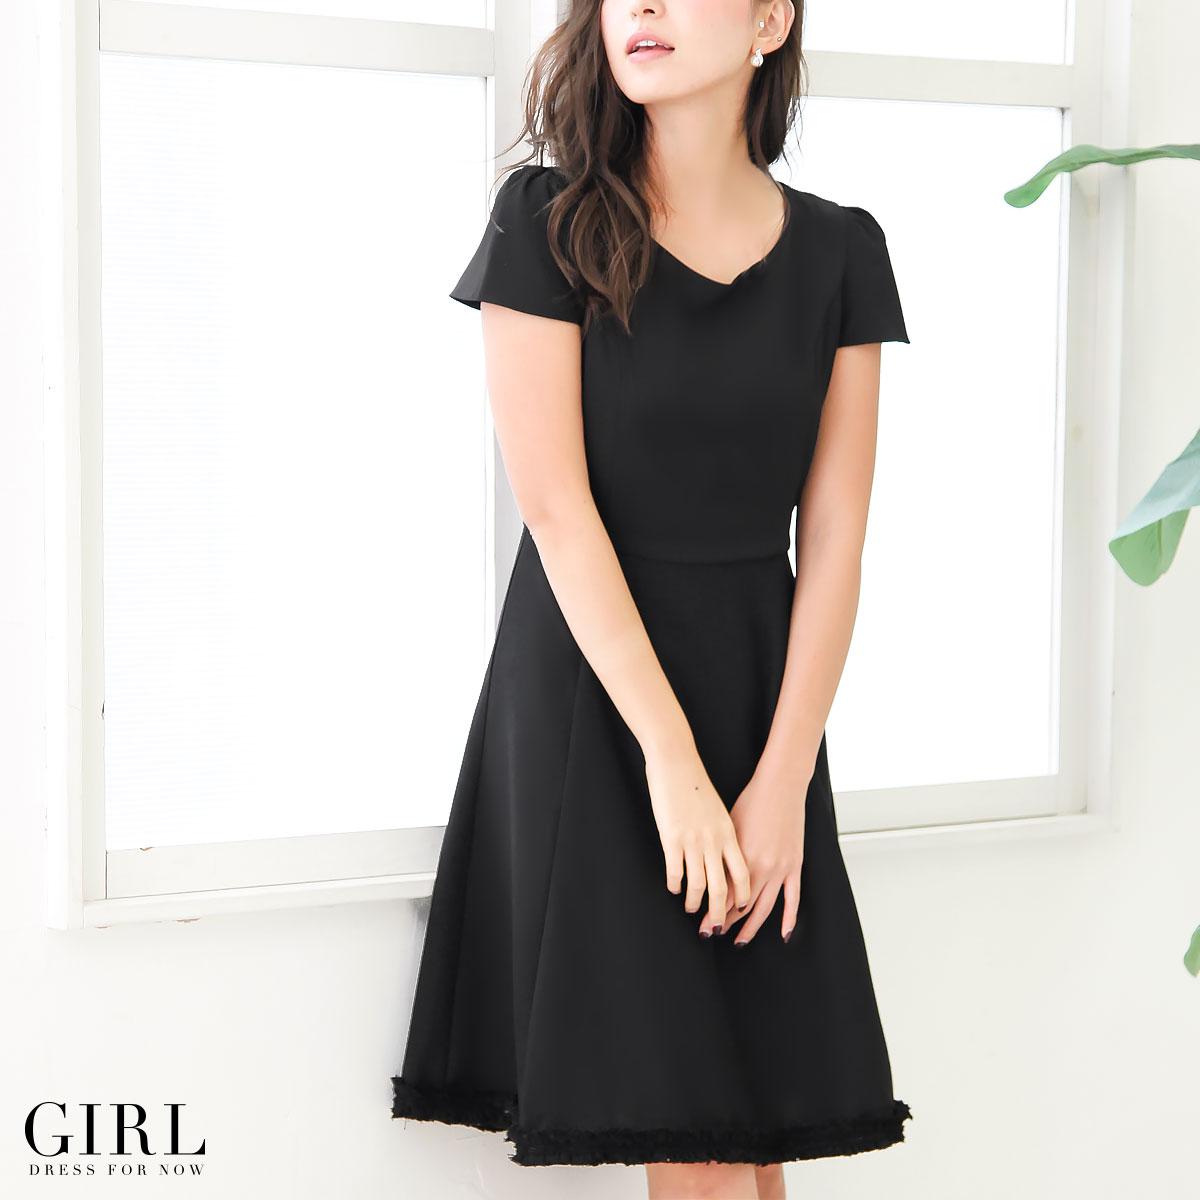 Black Dress for Graduation Ceremony